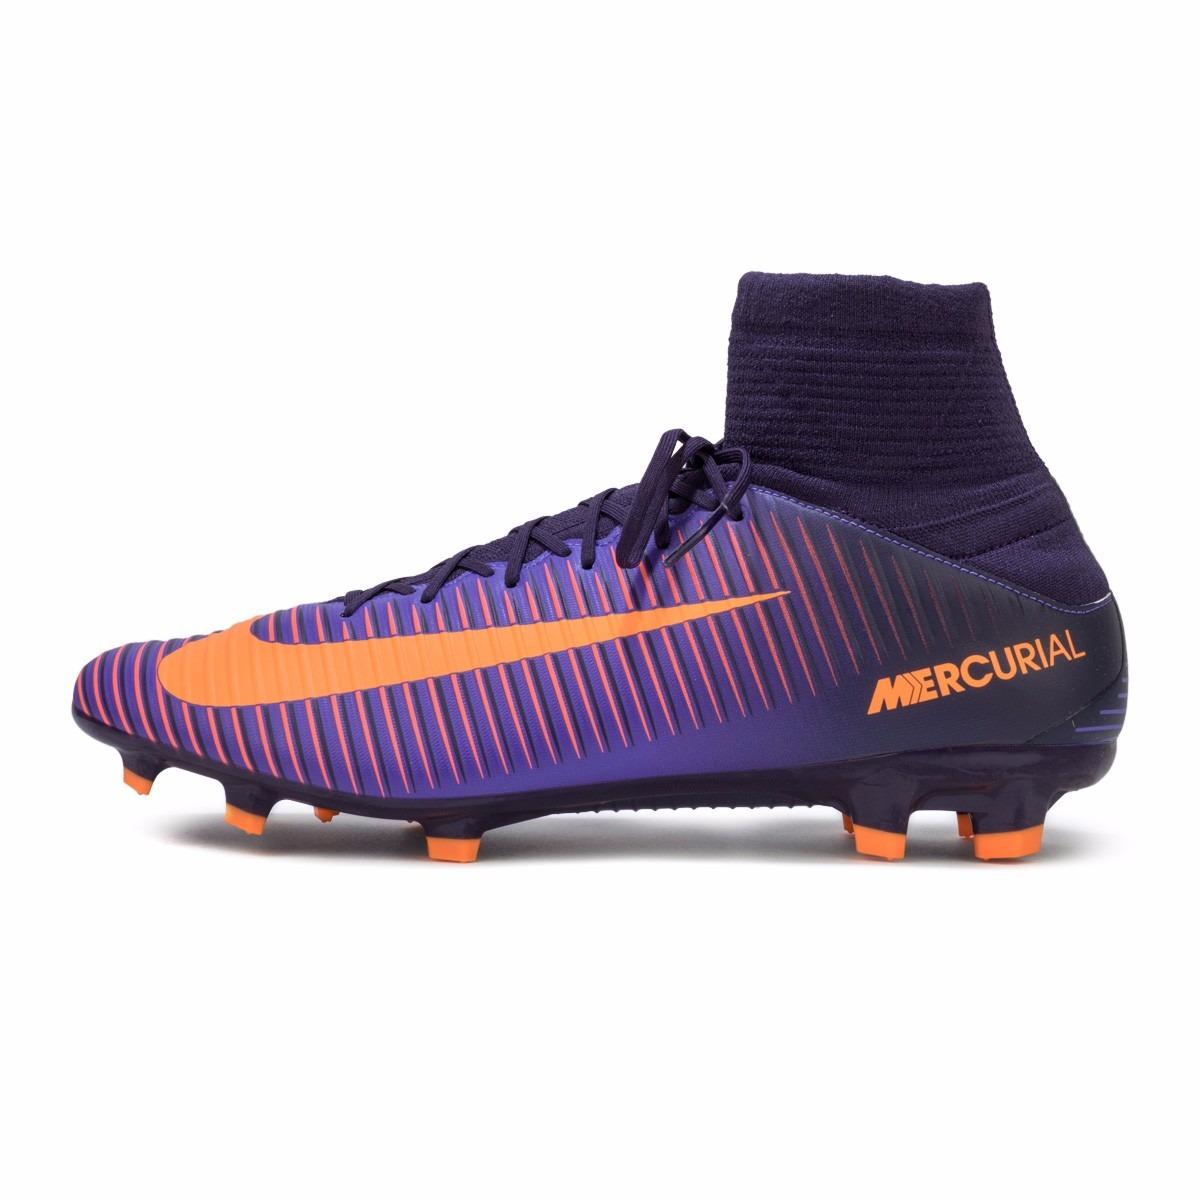 6cc21af78e0ba Guayos Nike Mercurial Superfly V Futbol Cesped -   290.000 en ...